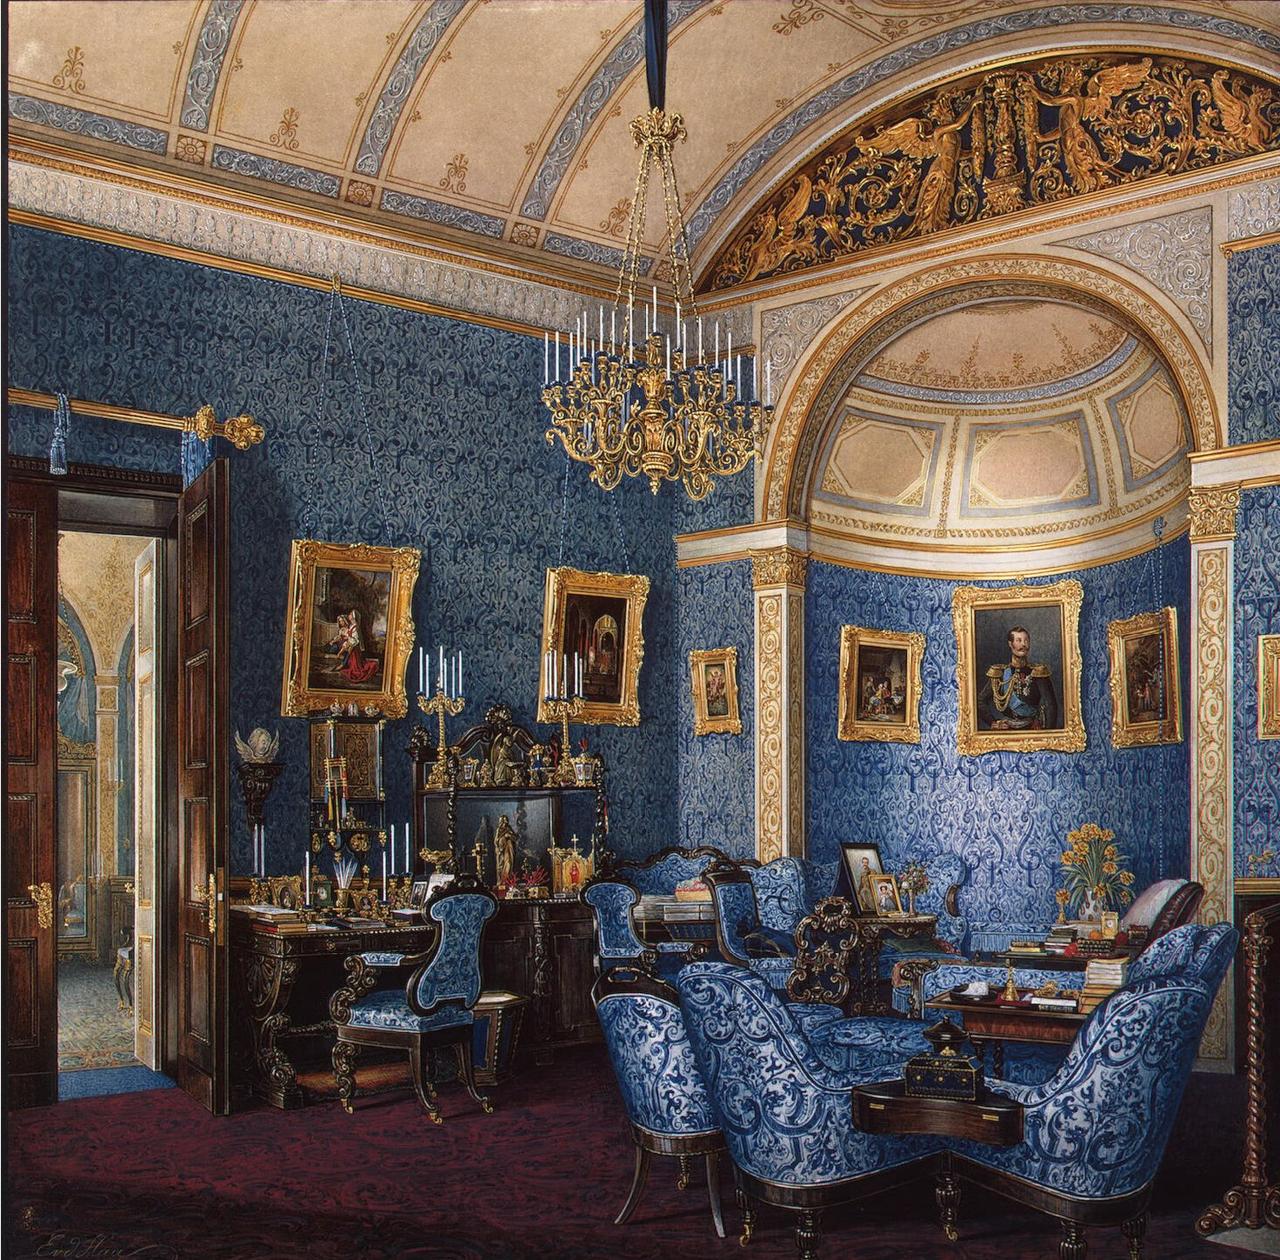 Интерьеры Зимнего дворца. Будуар великой княгини Марии Александровны